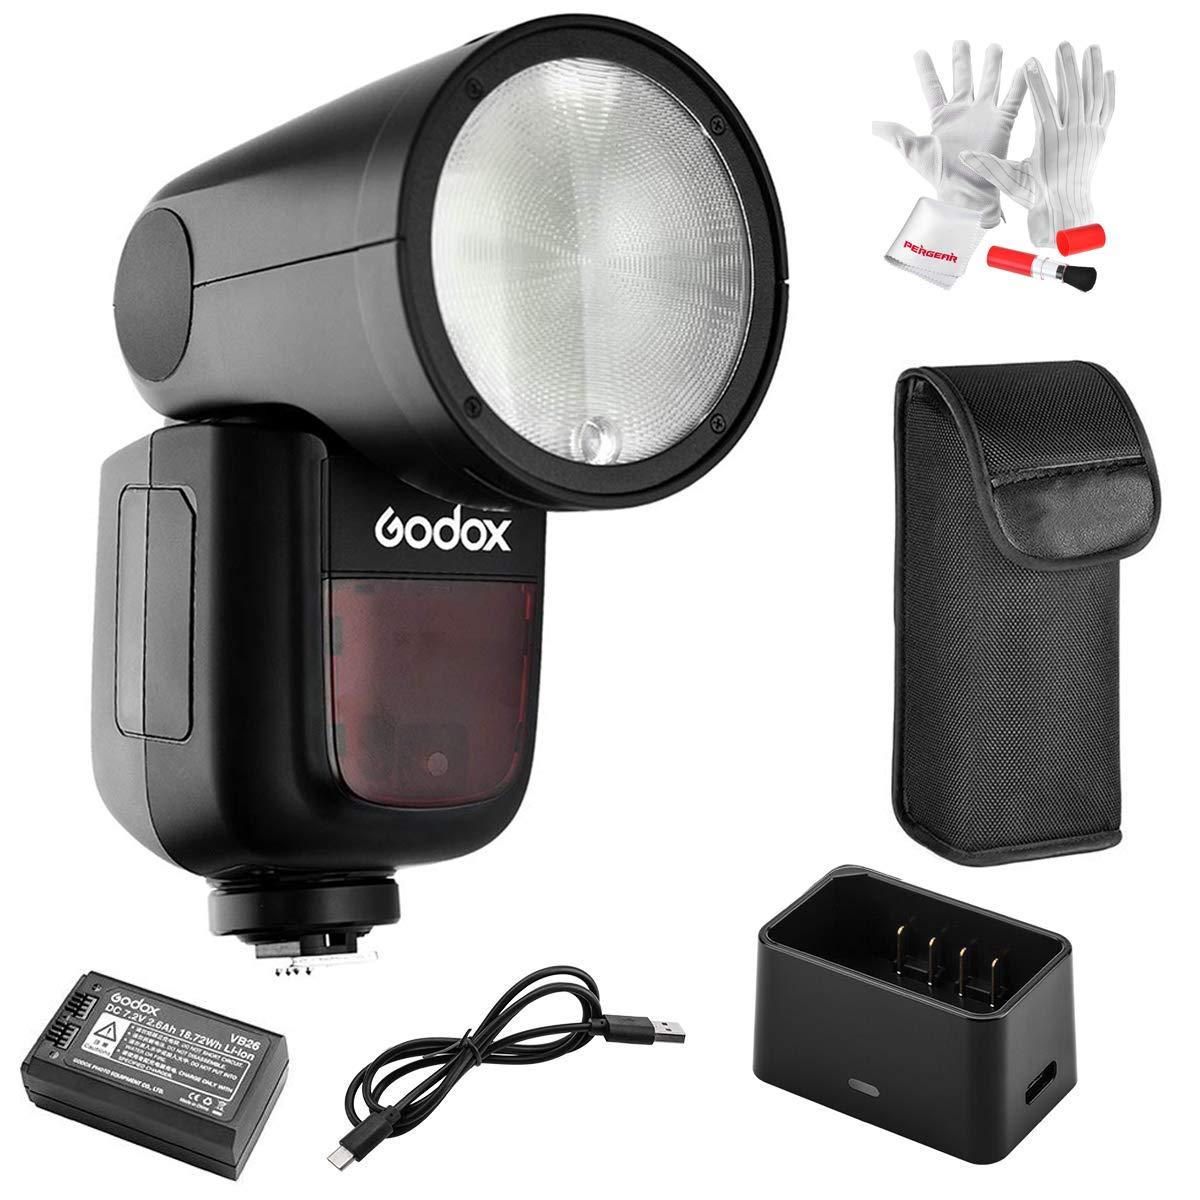 Godox V1-C Flash for Canon, 76Ws 2.4G TTL Round Head Flash Speedlight, 1/8000 HSS, 480 Full Power Shots, 1.5 sec. Recycle Time, Interchangeable 2600mAh Lithimu Battery, 10 Level LED Modeling Lamp